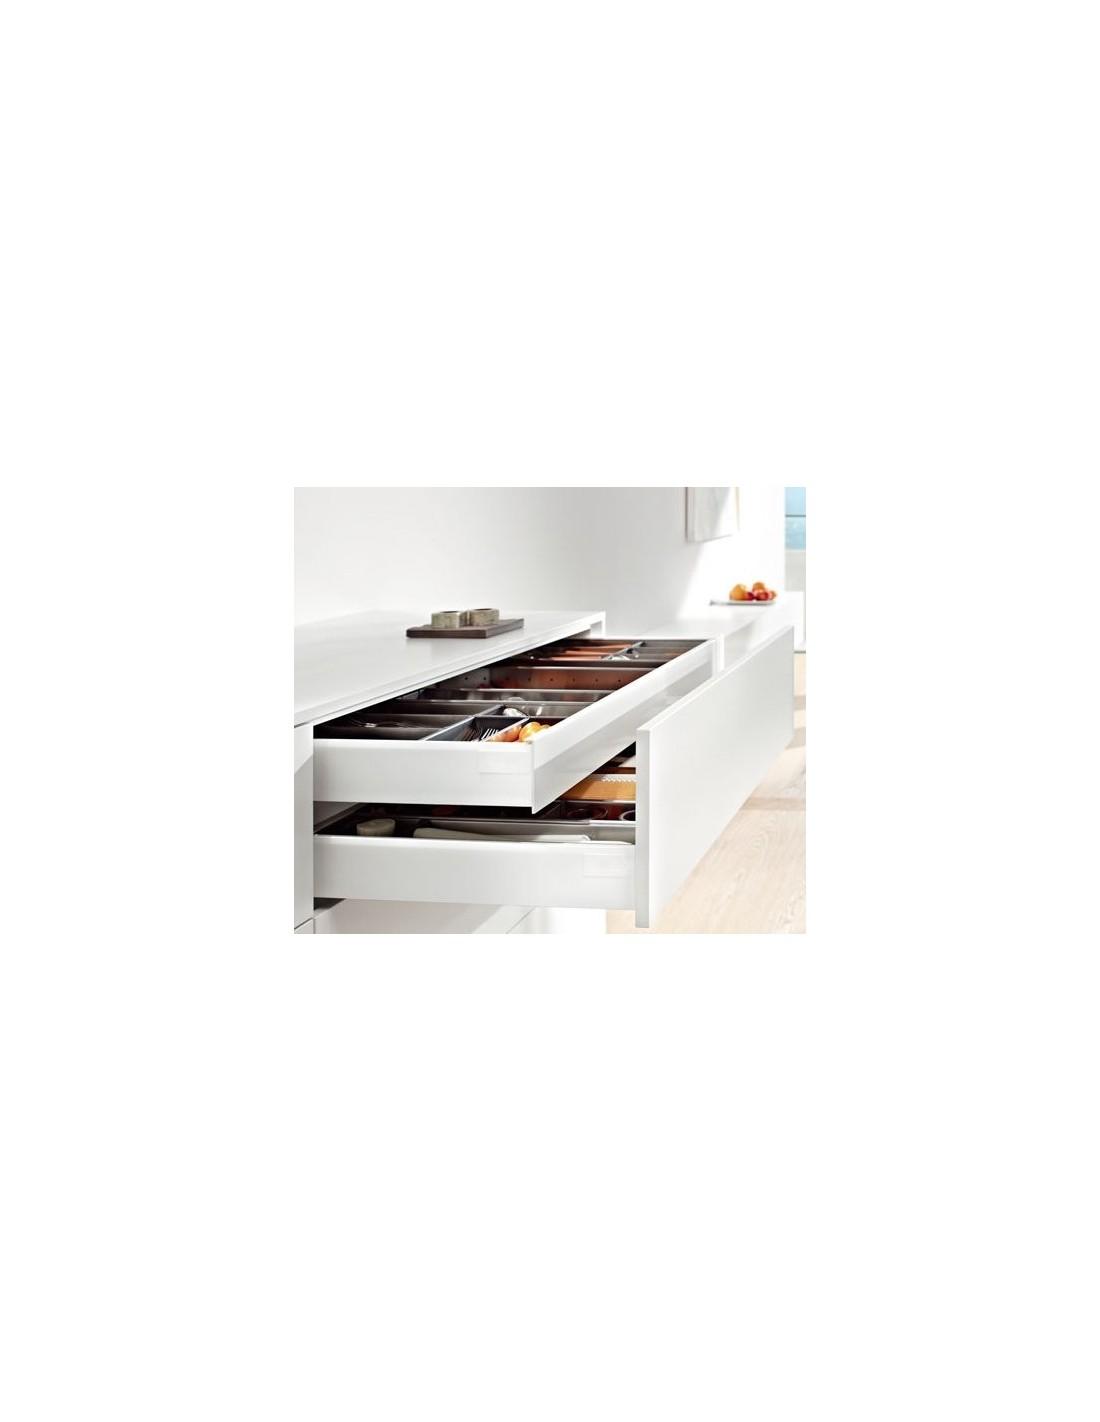 Blum secret inner drawer m height 99mm 300 1000mm widths Secret drawer